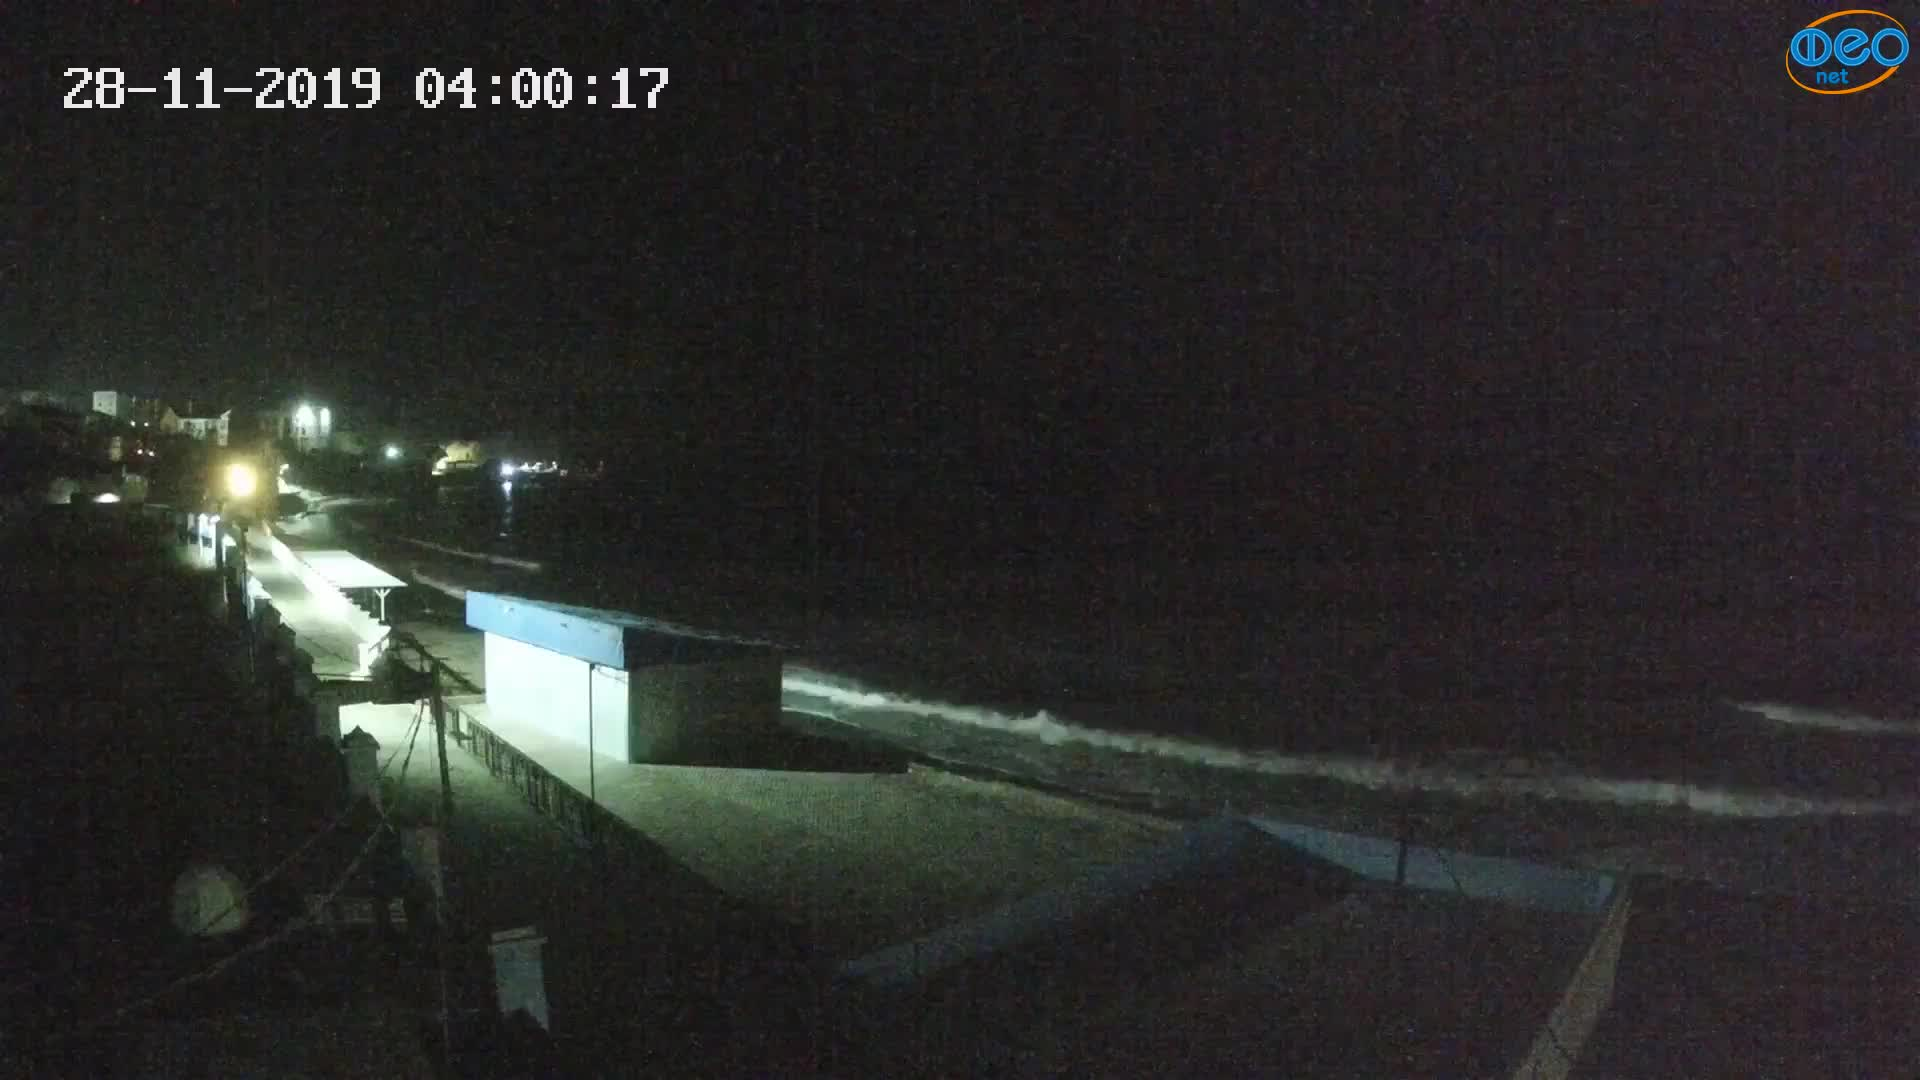 Веб-камеры Феодосии, Орджоникидзе - набережная - вид на Васюковку, 2019-11-28 04:00:41